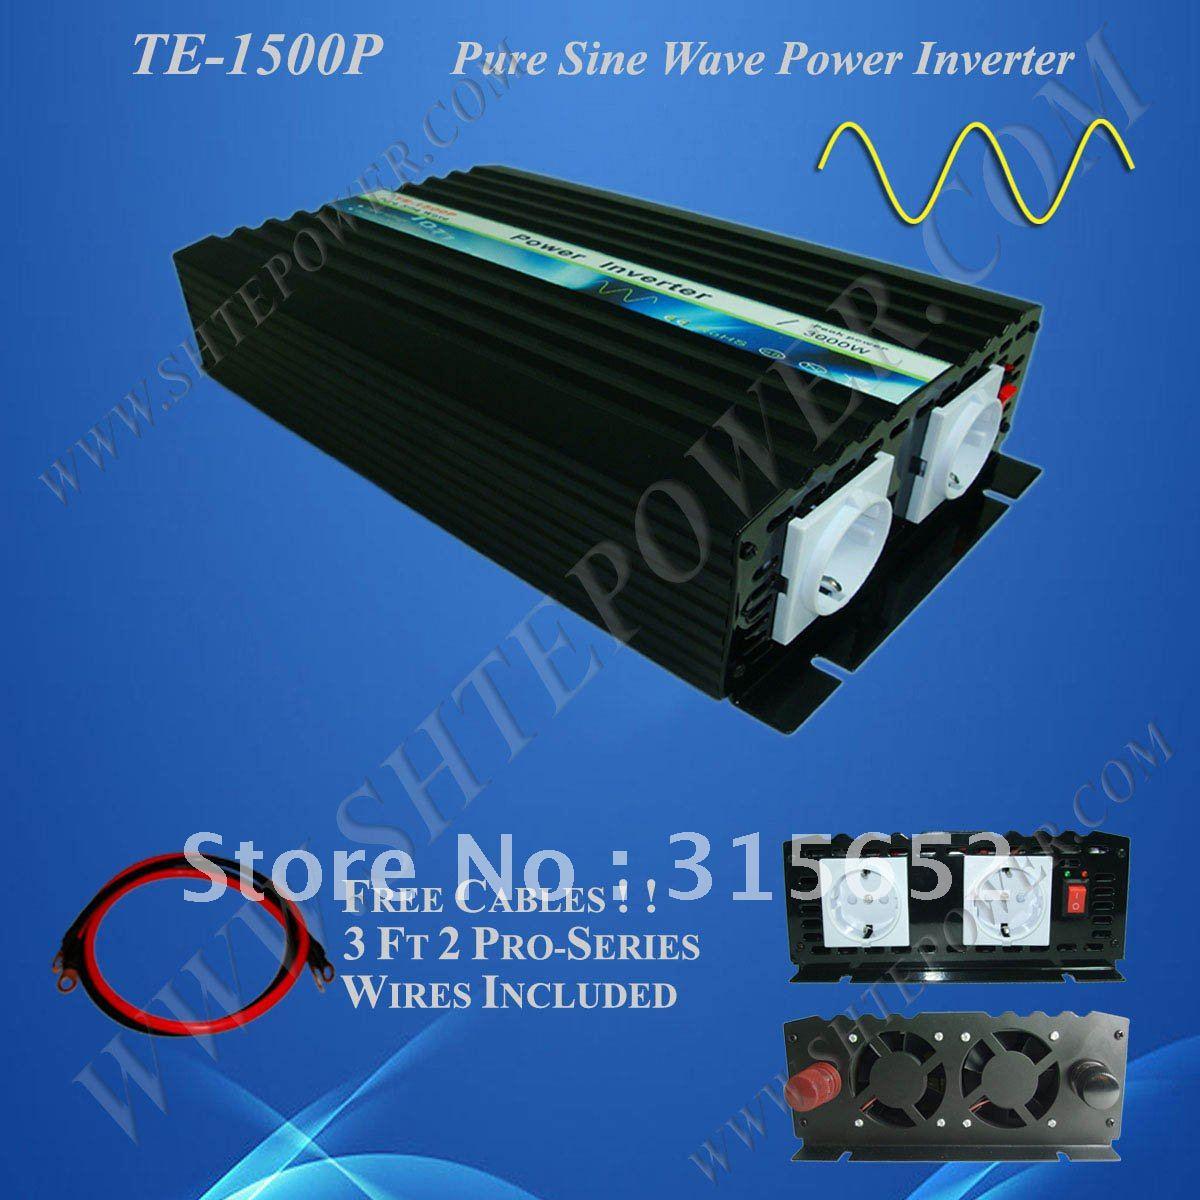 Hot sell 1500w Pure Sine Wave Power Inverter DC 12V to AC 240VHot sell 1500w Pure Sine Wave Power Inverter DC 12V to AC 240V